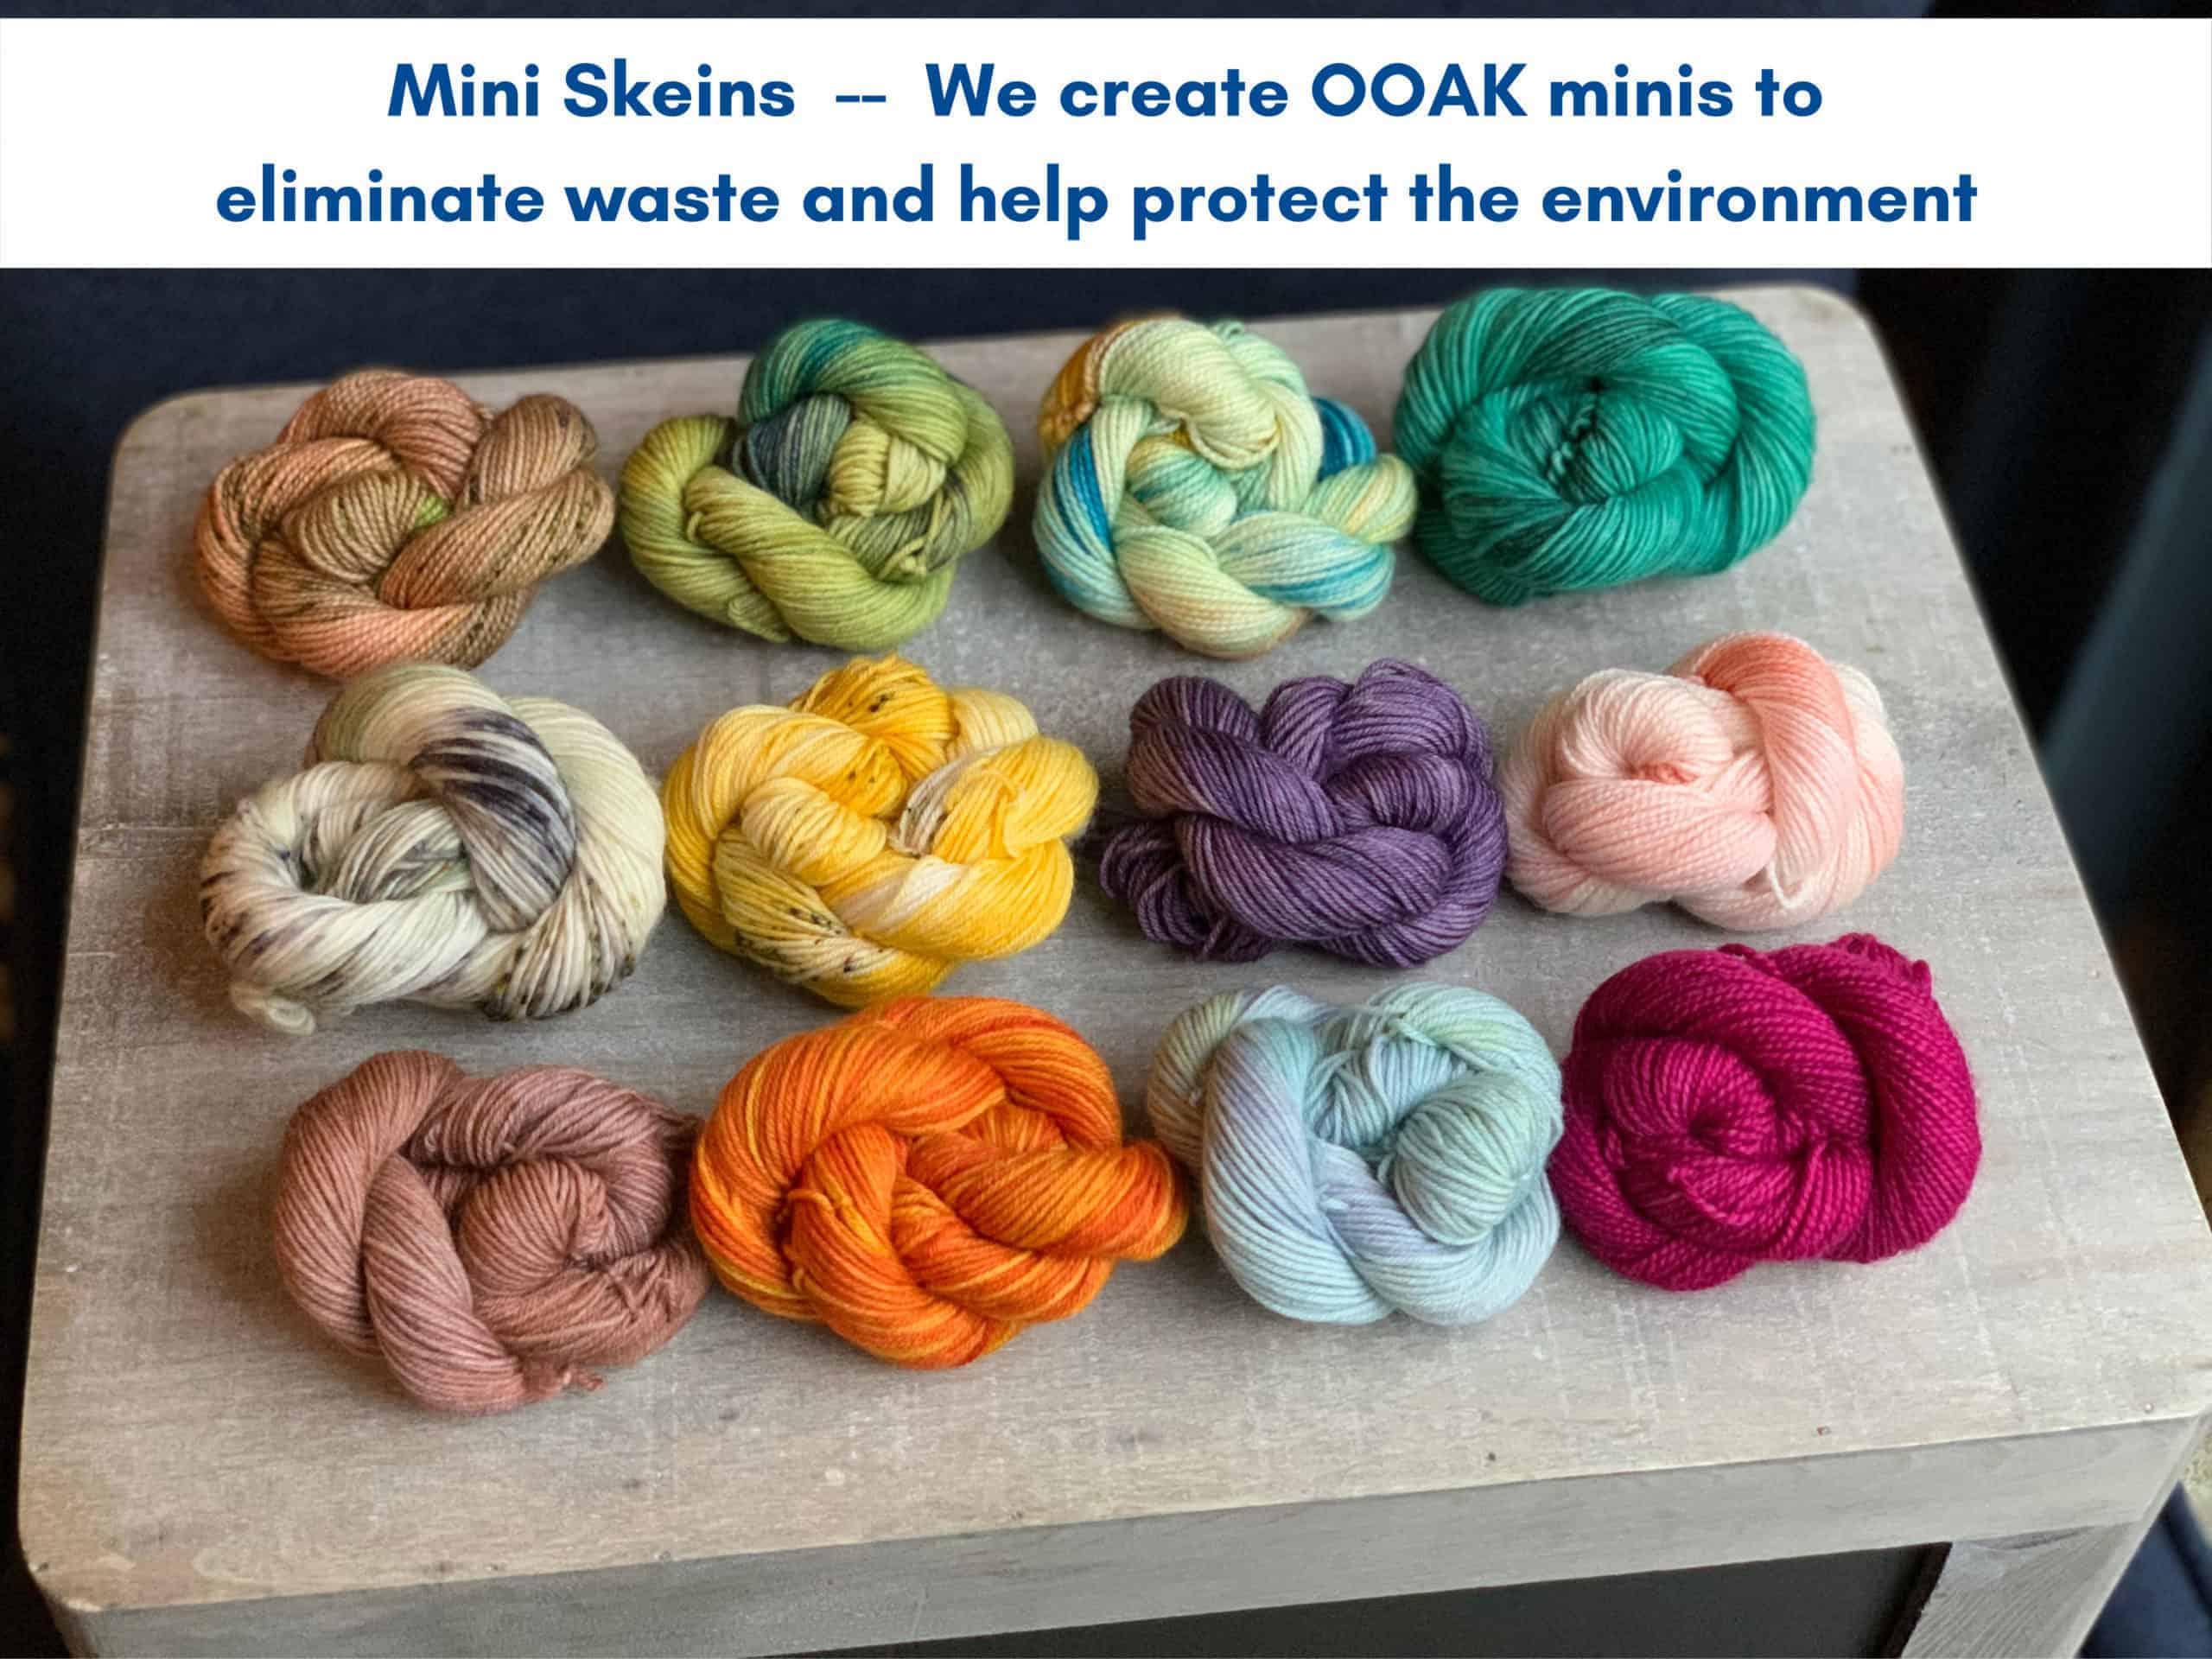 Multicolored skeins of yarn.